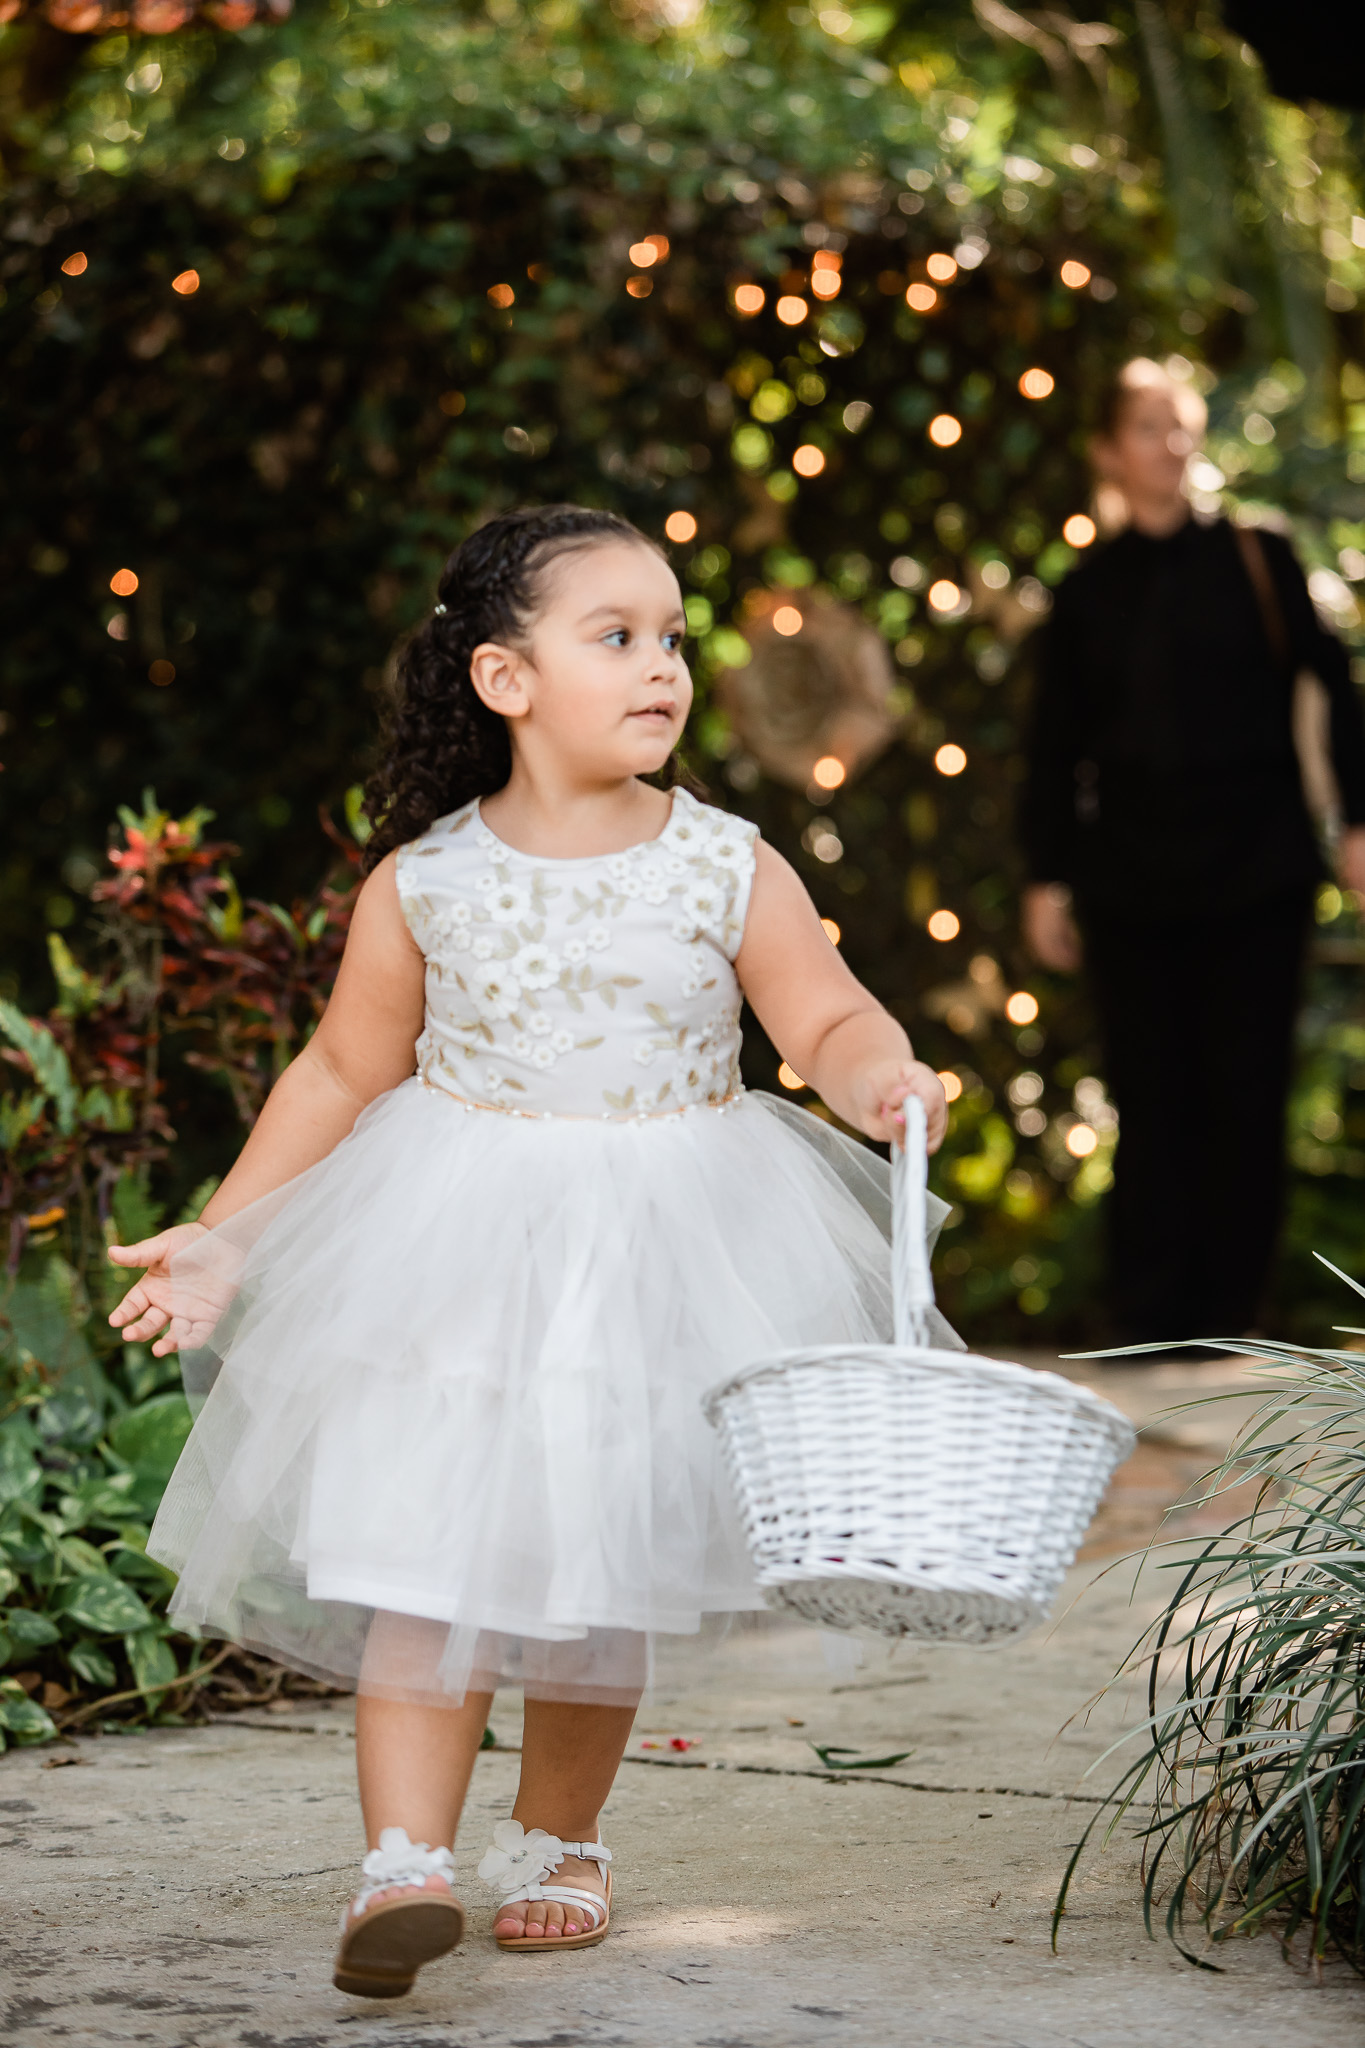 TAMPA_WEDDING_GIGIS_COUNTRY_GARDEN_CJMZ_TJL48202.jpg